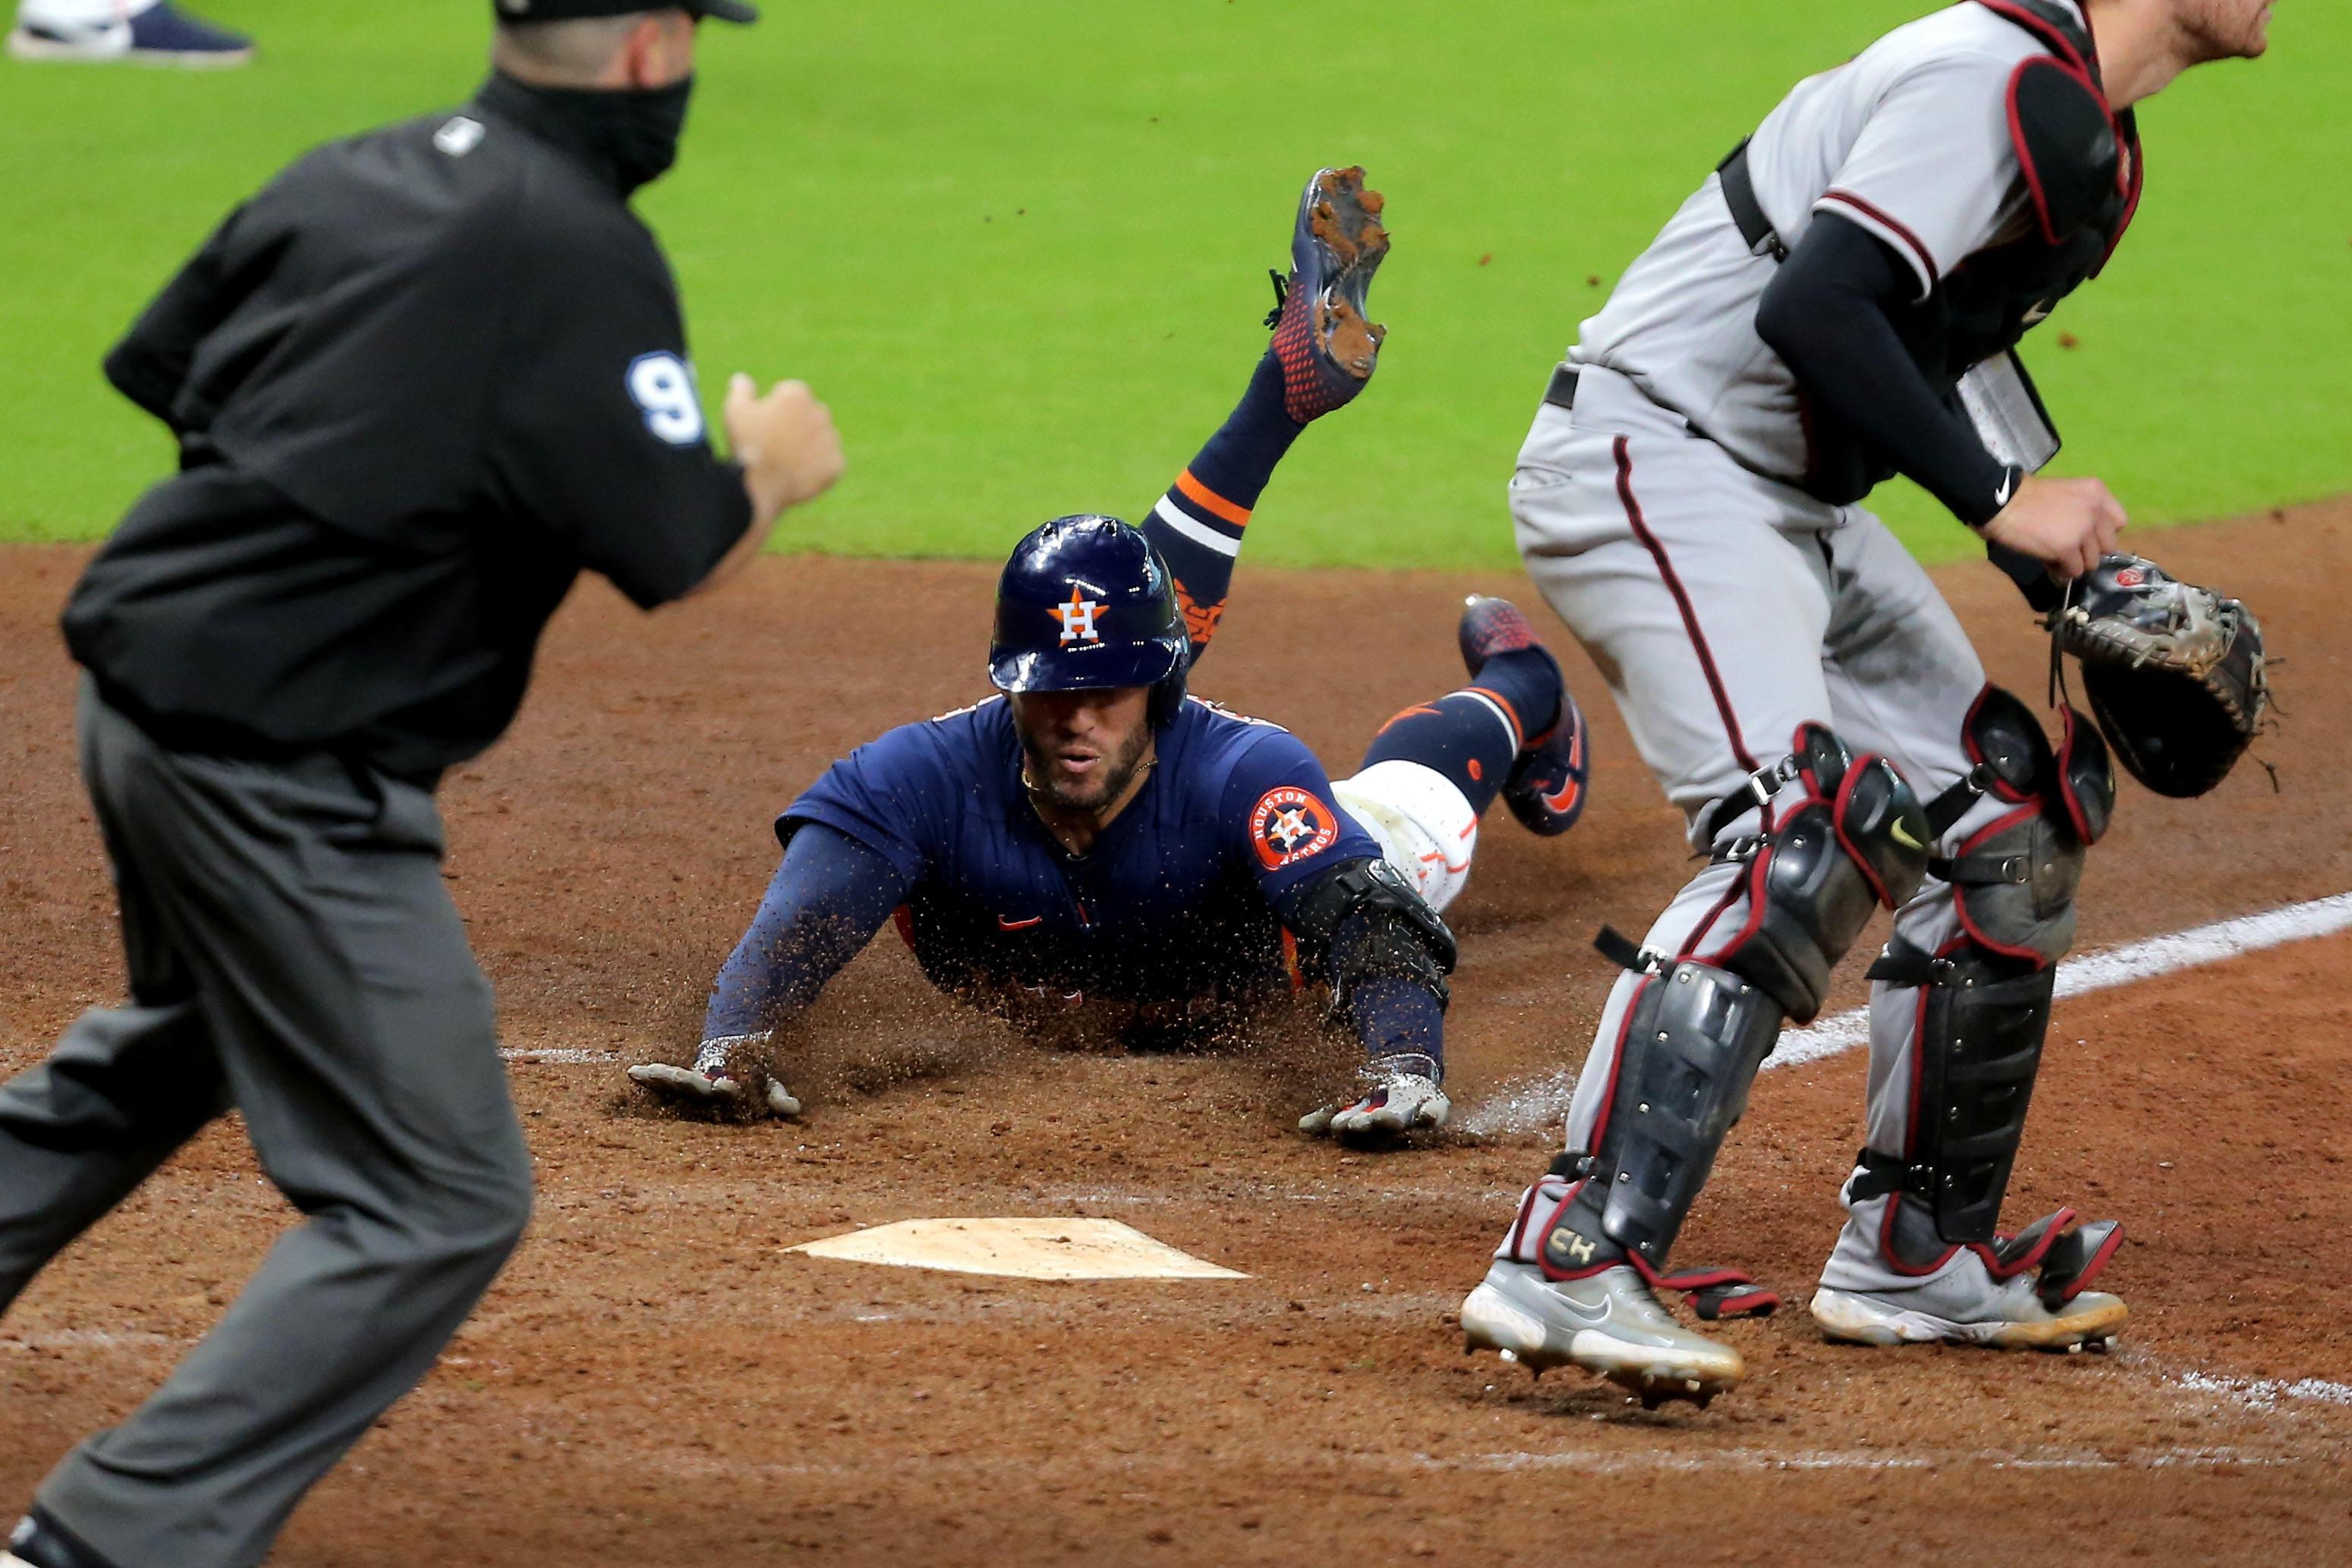 MLB: Arizona Diamondbacks at Houston Astros